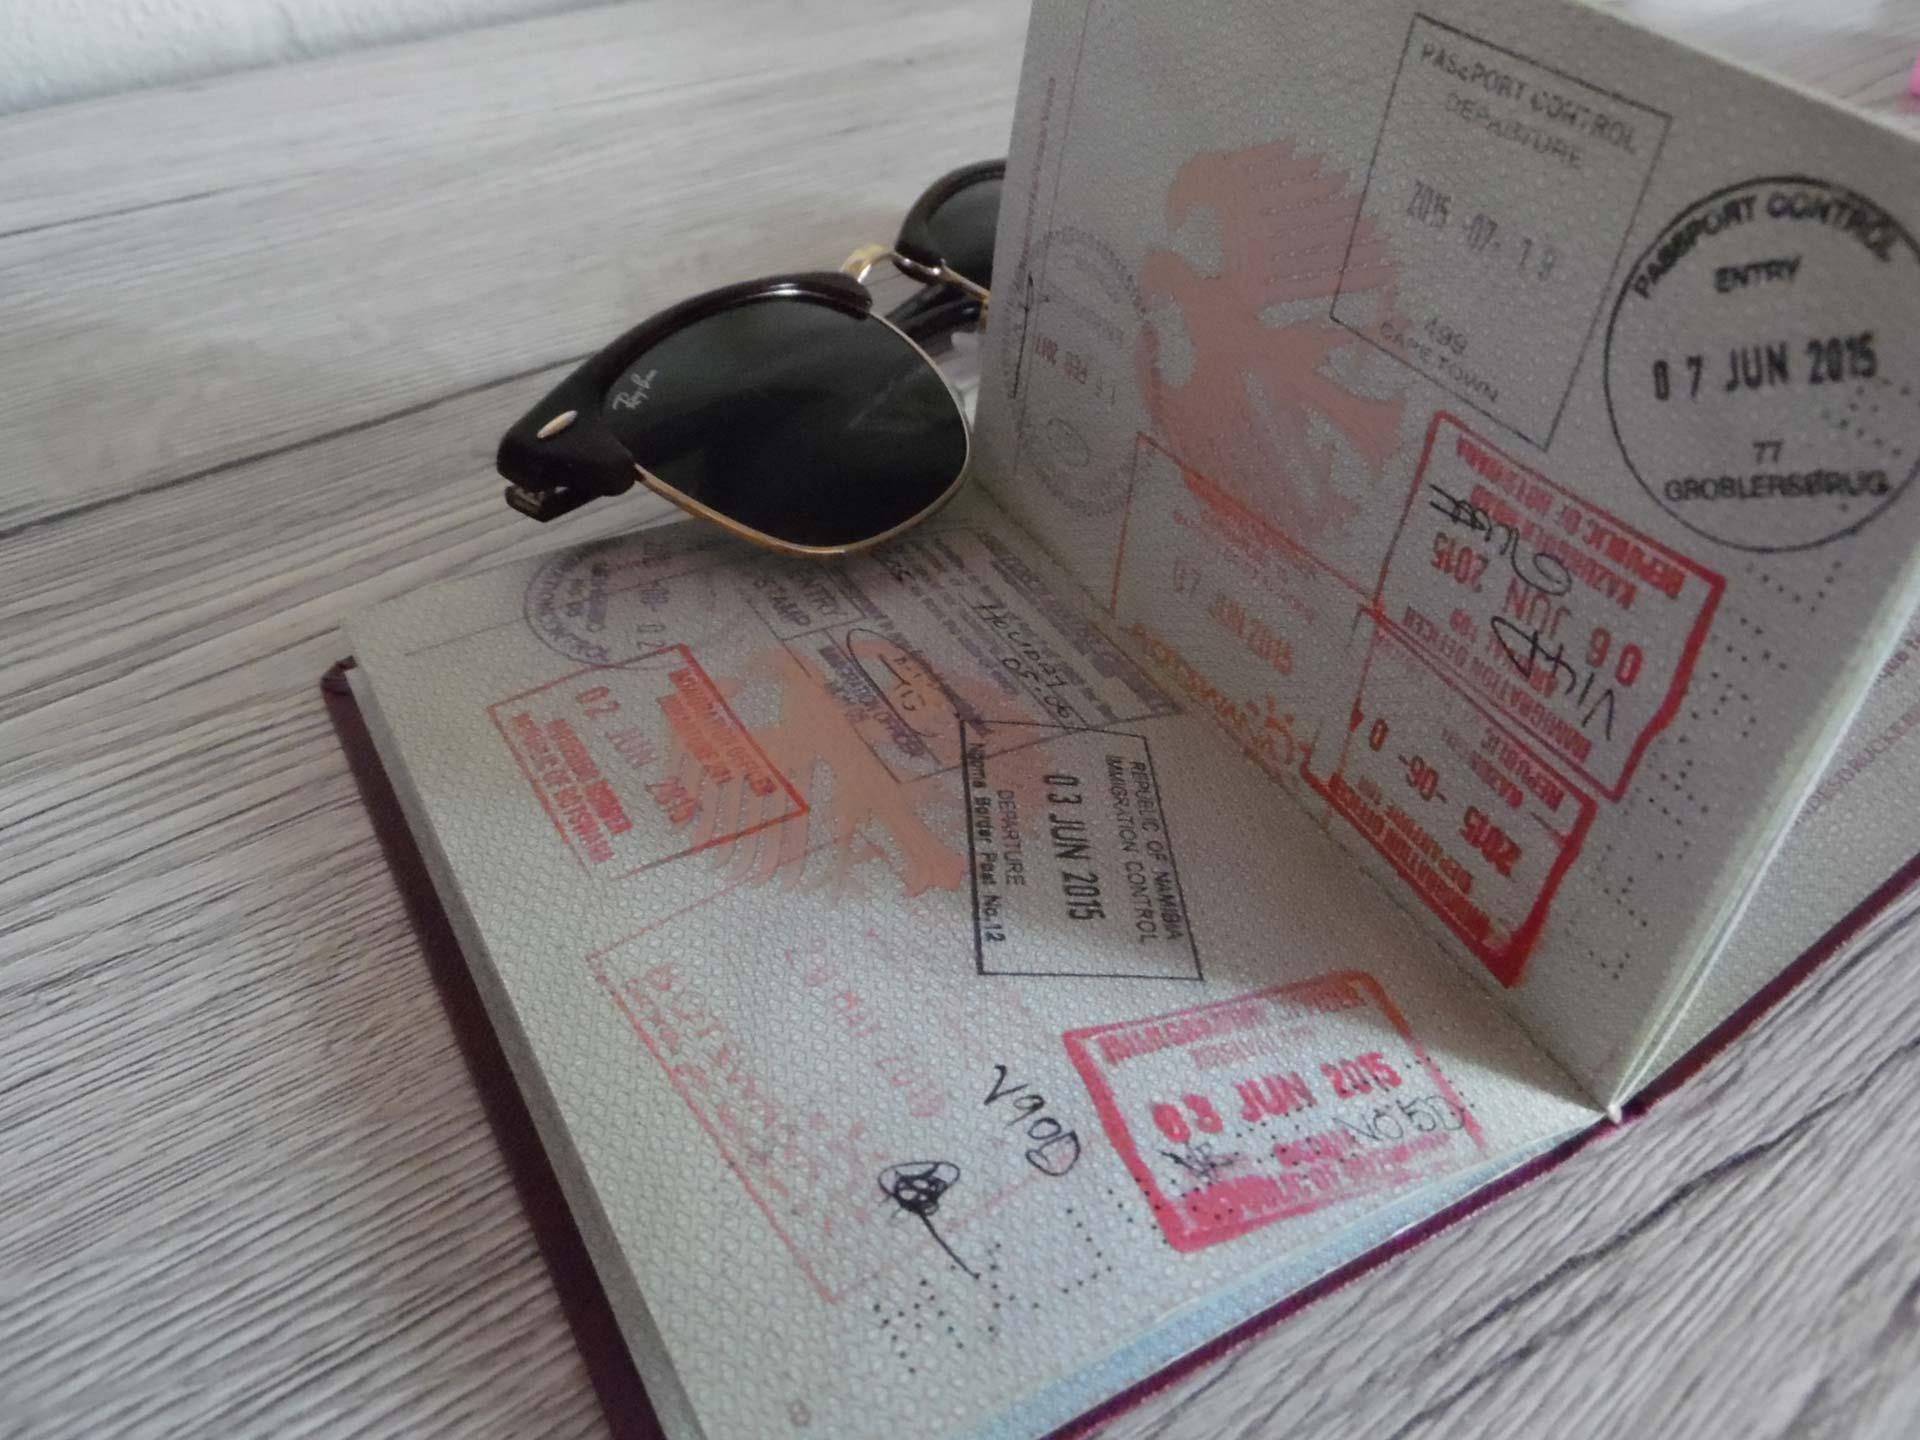 Reiseinformationen Einreise Visum Reisepass Afrika